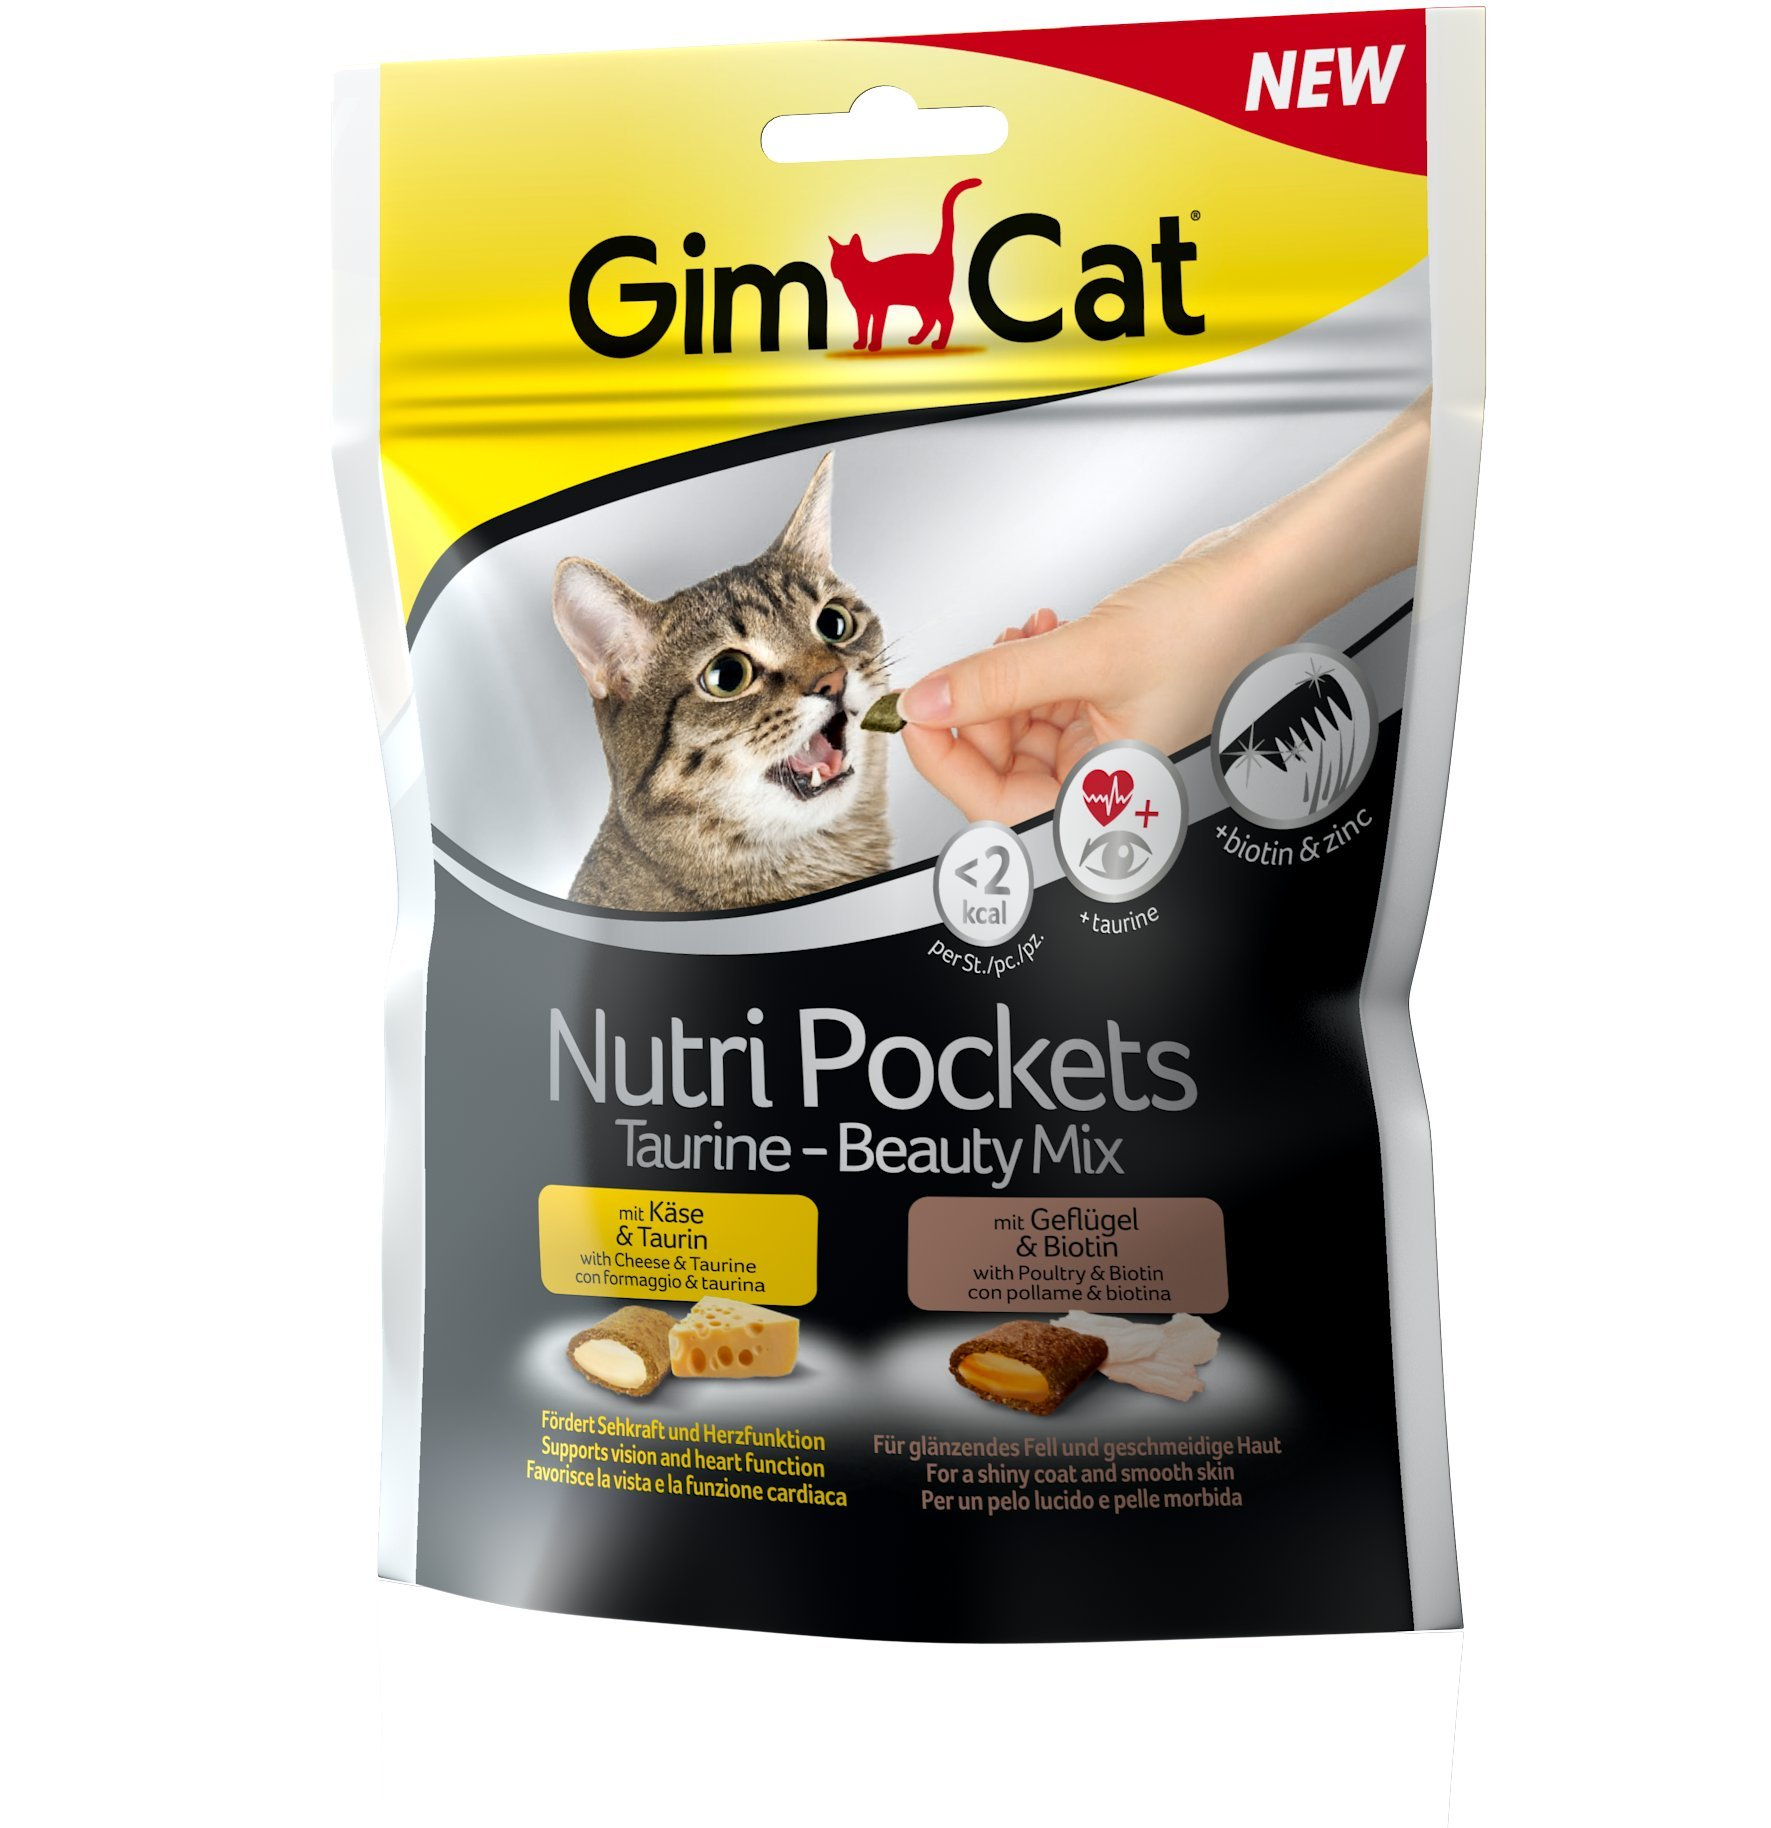 GimCat Nutri Pockets – Snack crujiente para gatos: provisto de relleno cremoso e ingredientes funcionales – Sin azúcar añadido – Mezcla Beauty de taurina  – 1 bolsa (1 x 150 g)